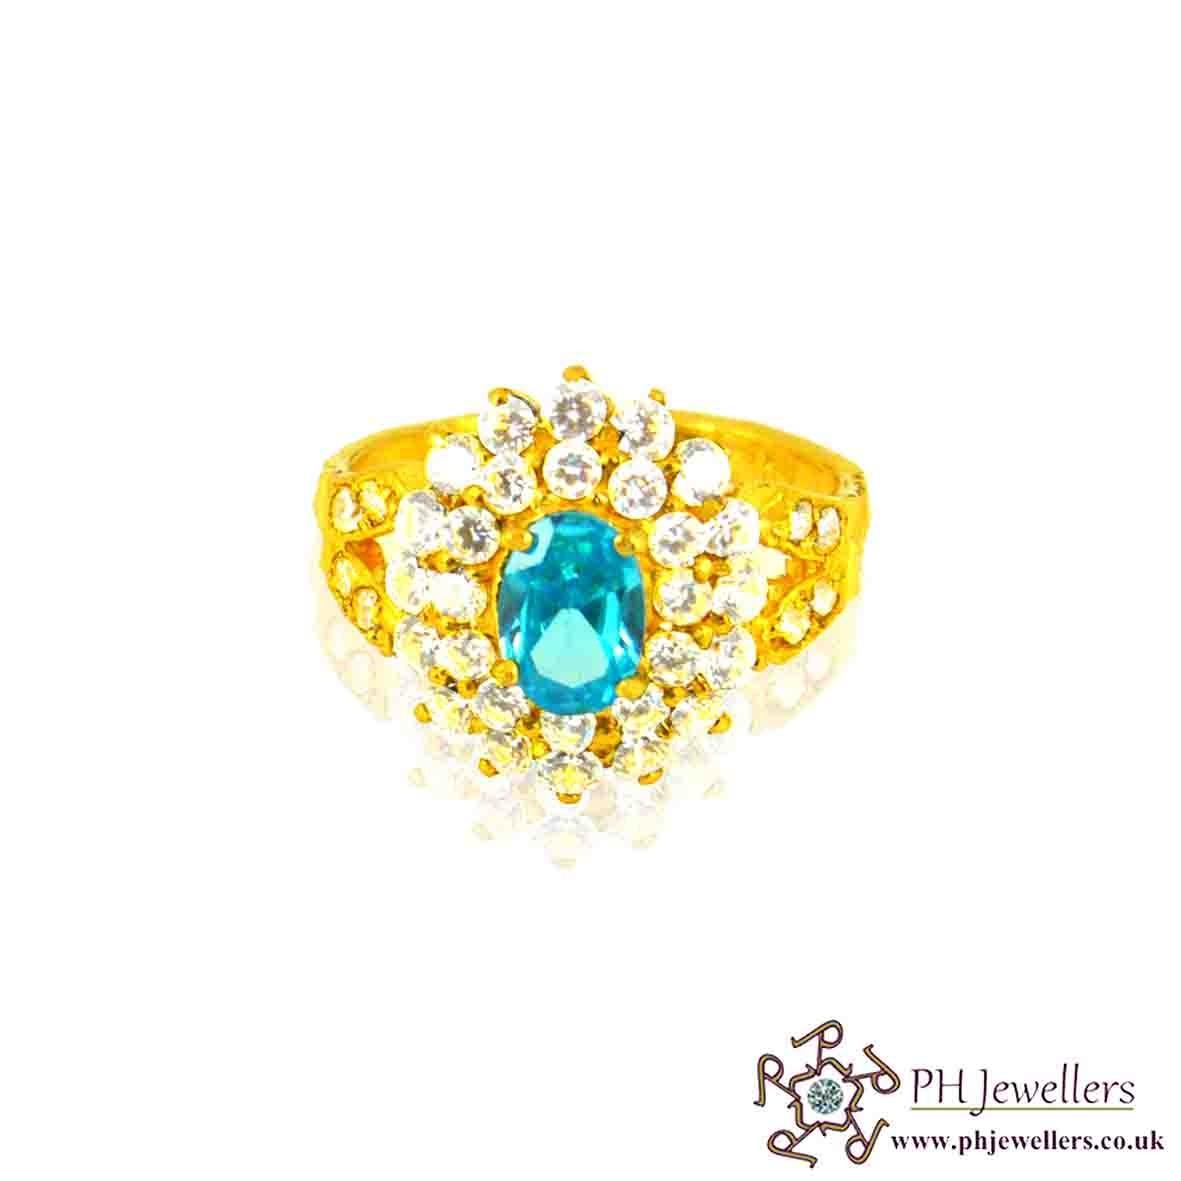 22ct 916 Hallmark Yellow Gold Cluster Oval Firoza Size L1/2,M,N Ring CZ SR20